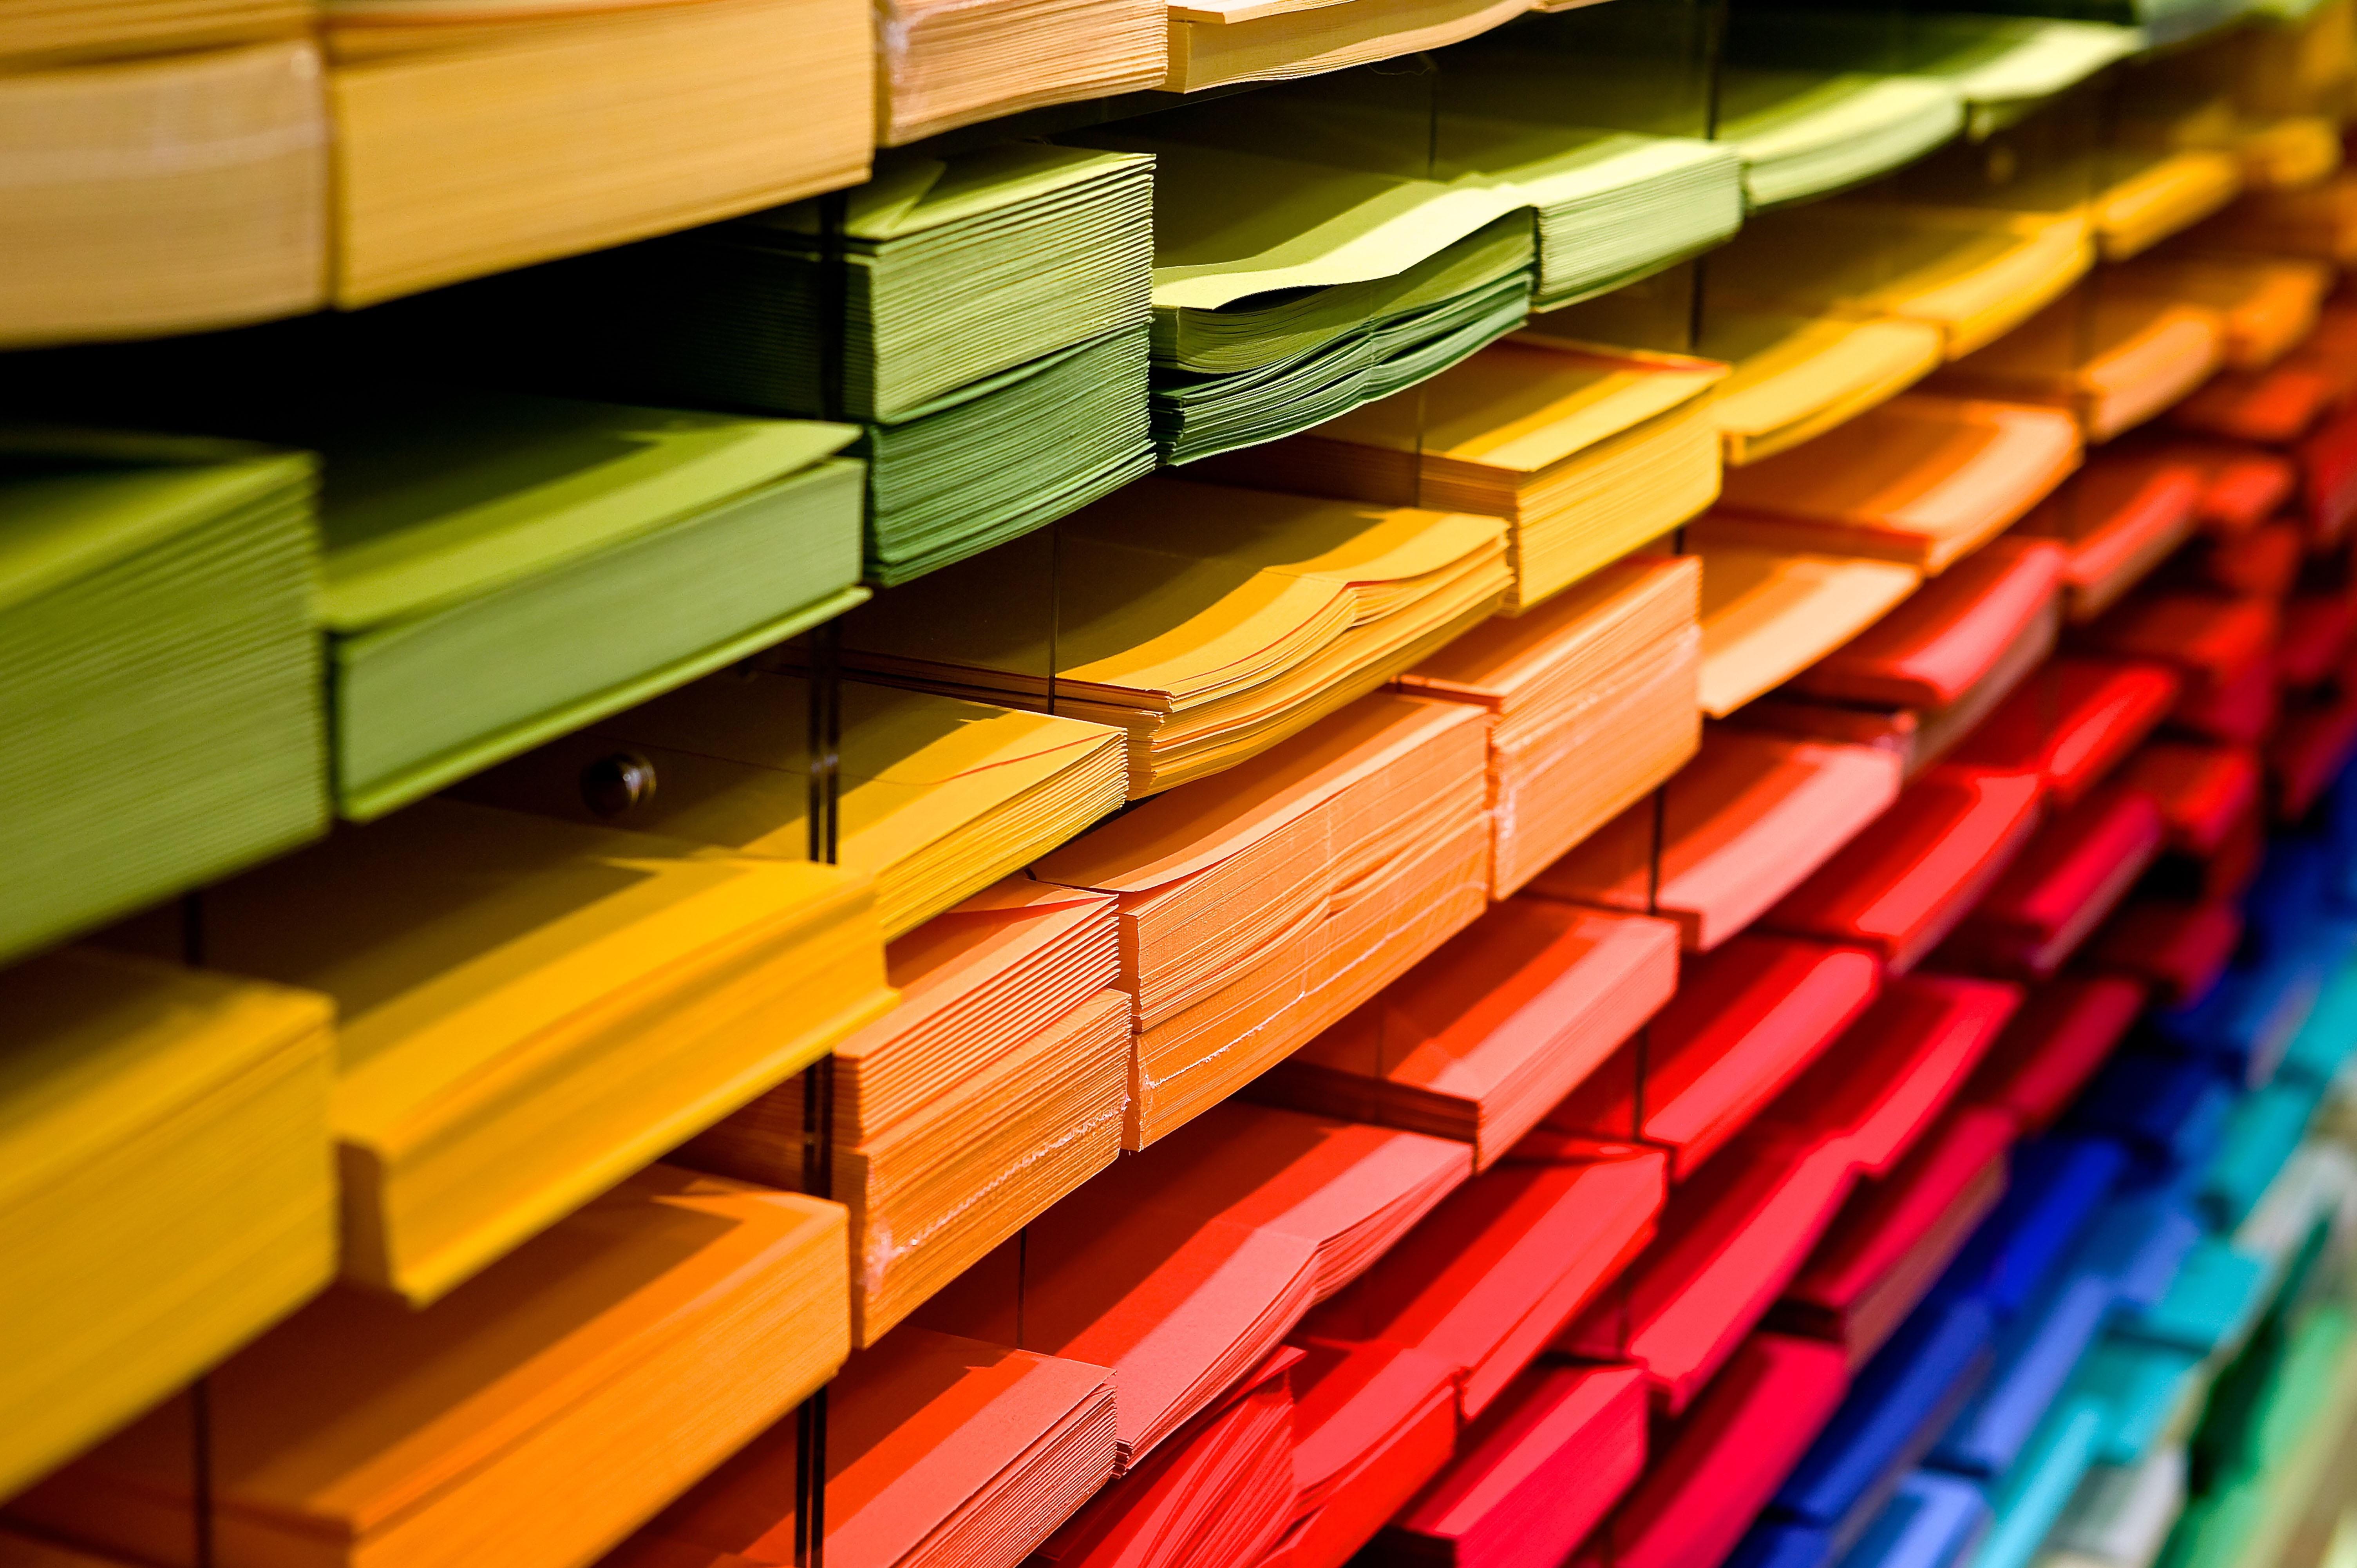 Fotos gratis : madera, fila, pila, línea, vistoso, color, mueble ...